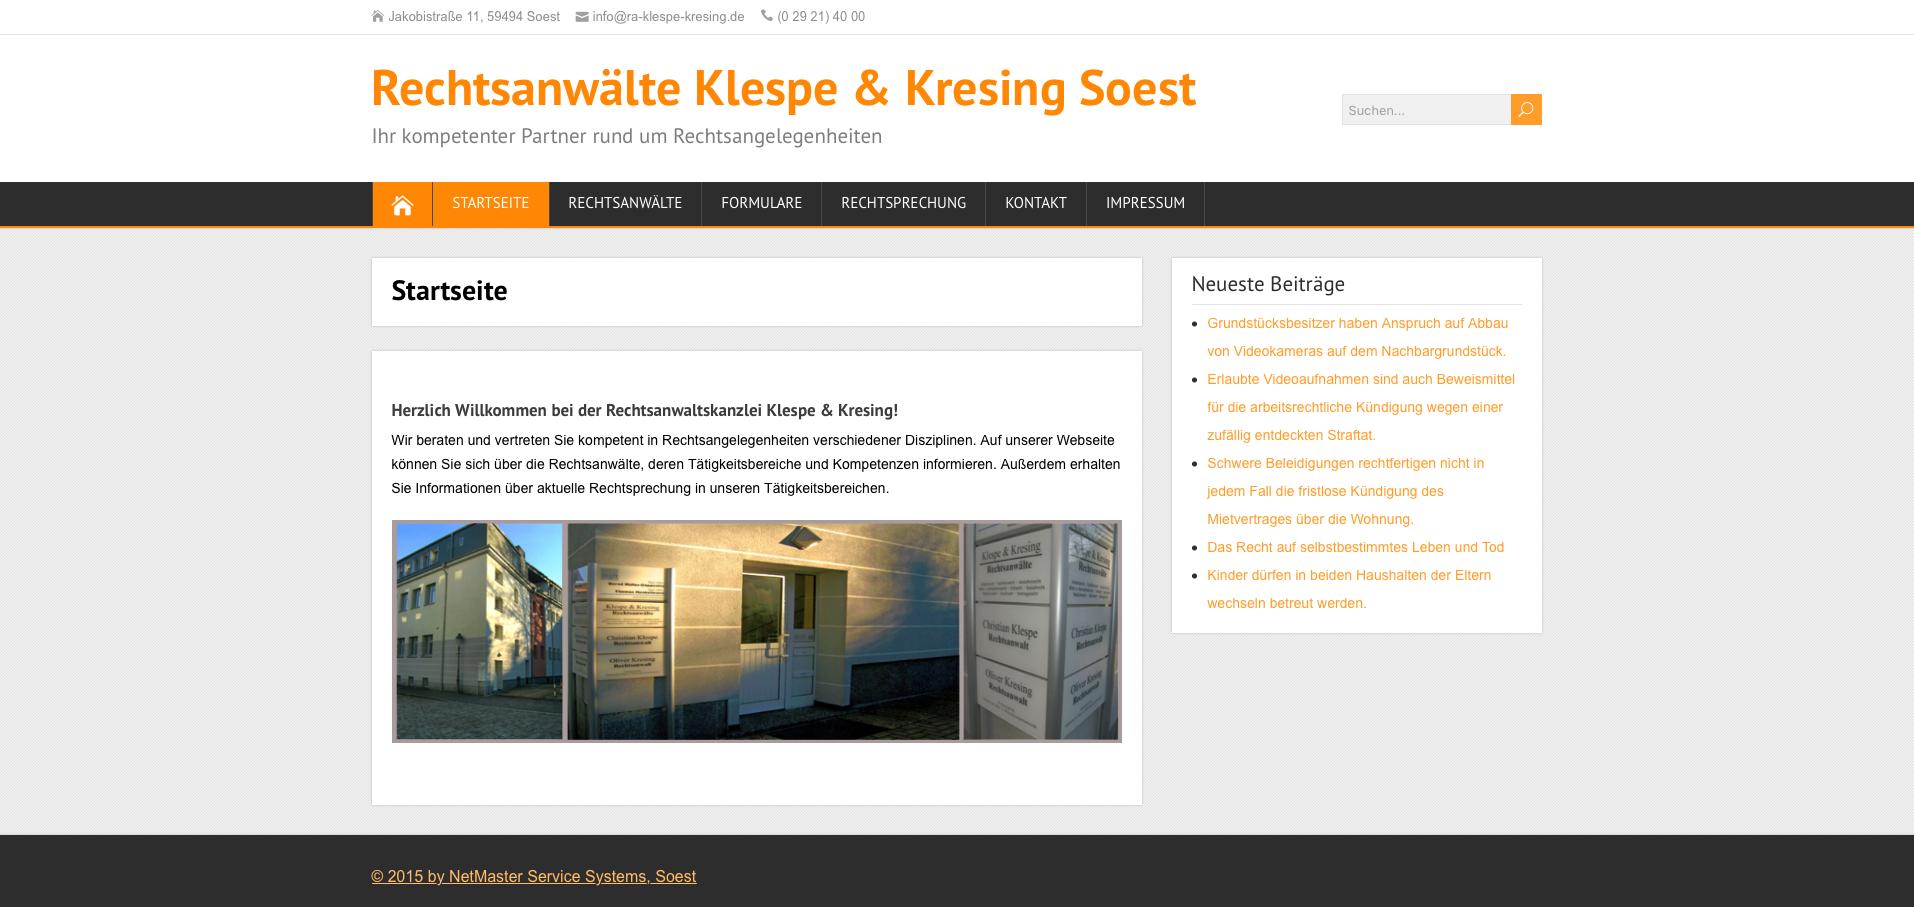 www.ra-klespe-kresing.de